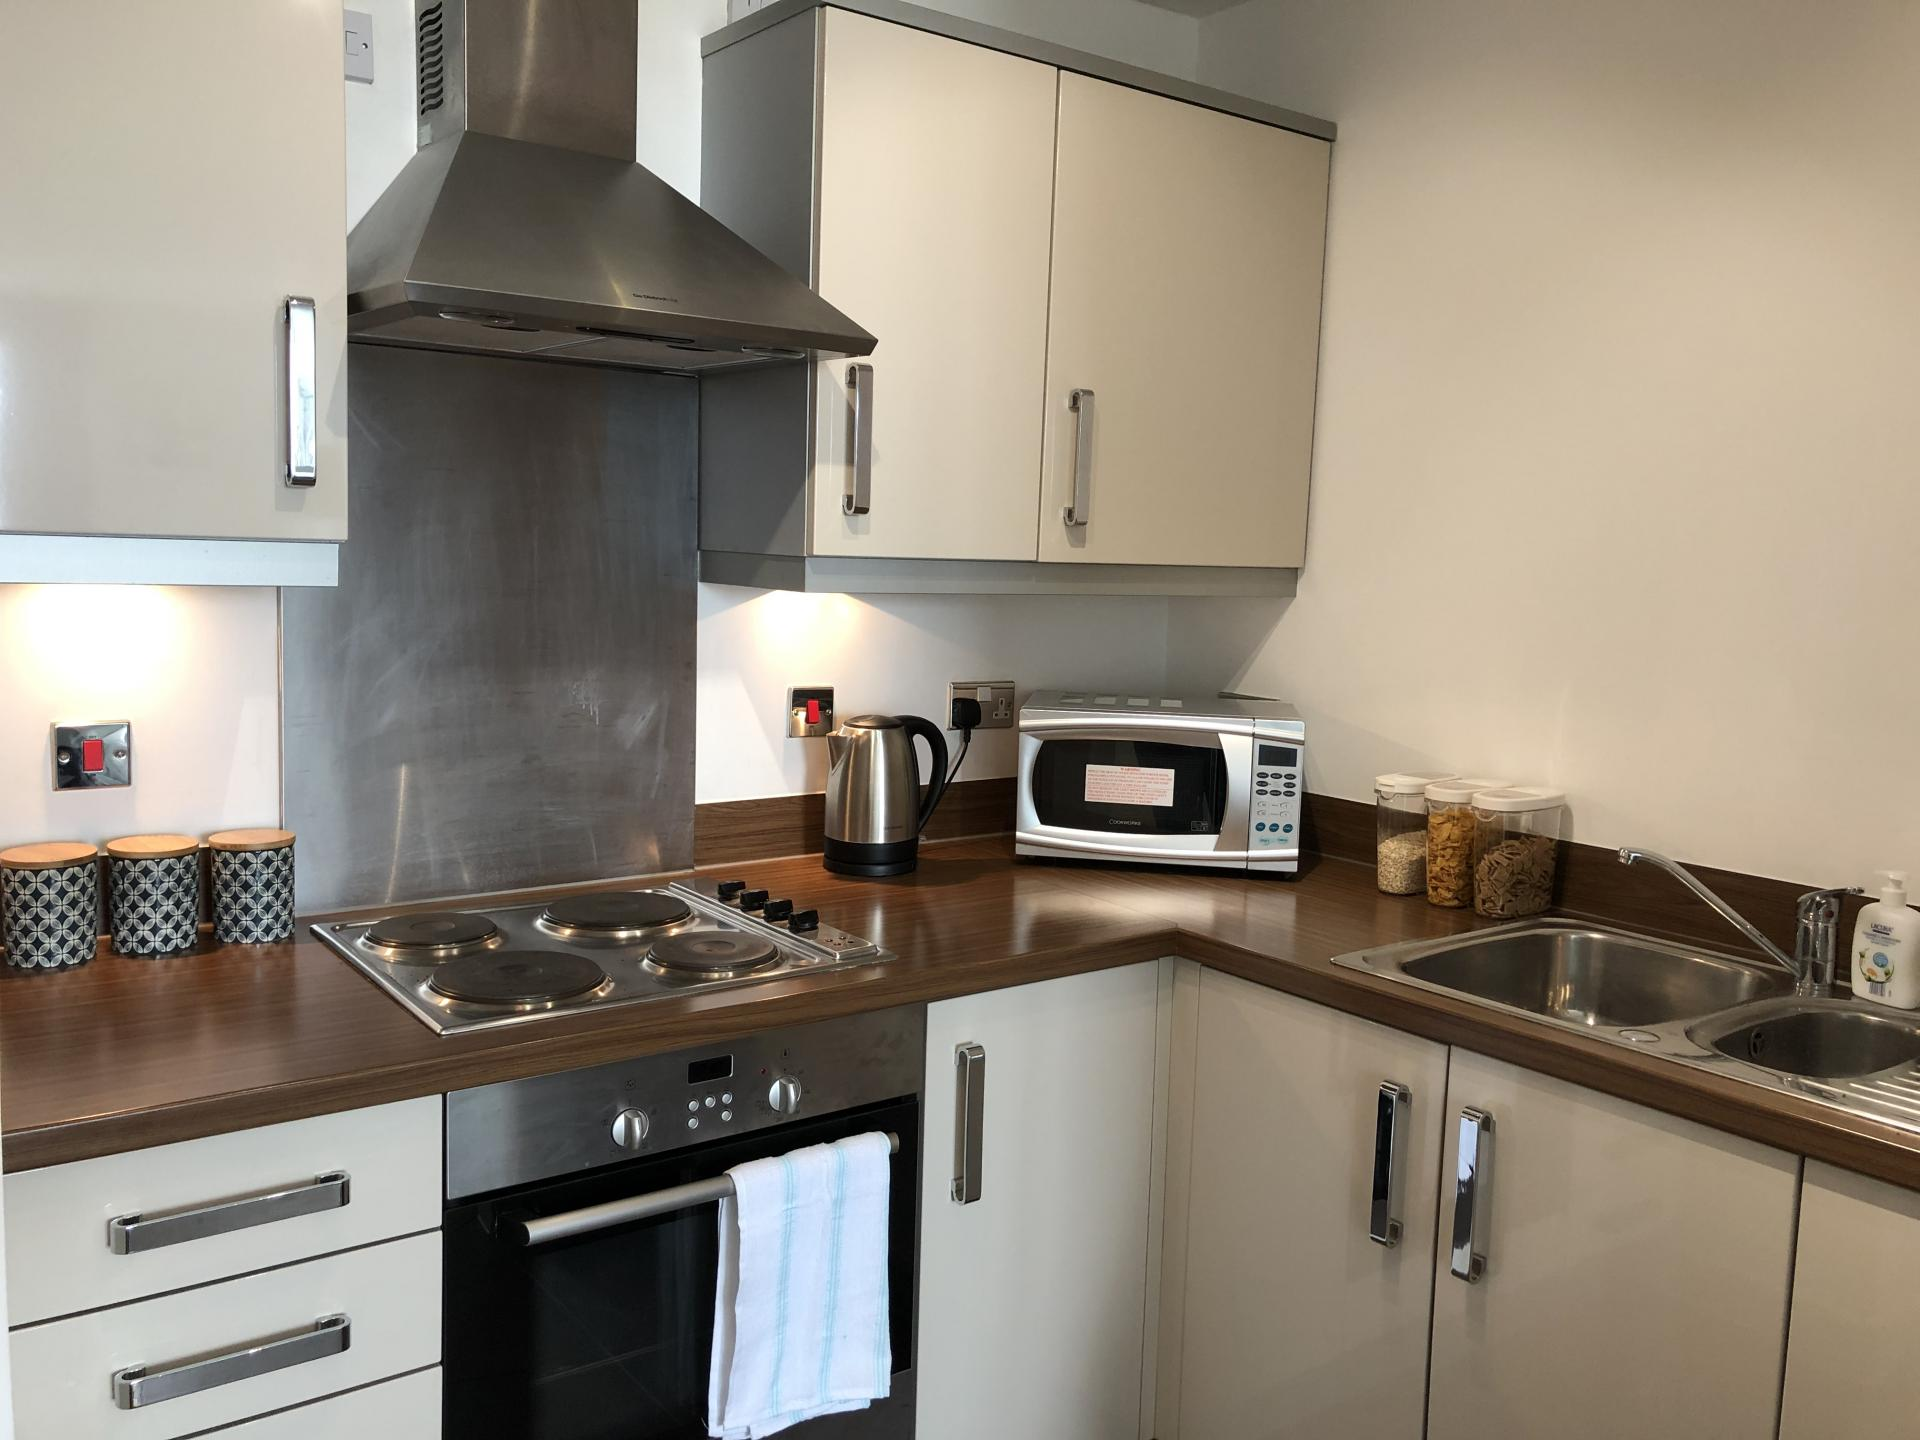 Kitchen at The Hub Serviced Apartments - Citybase Apartments